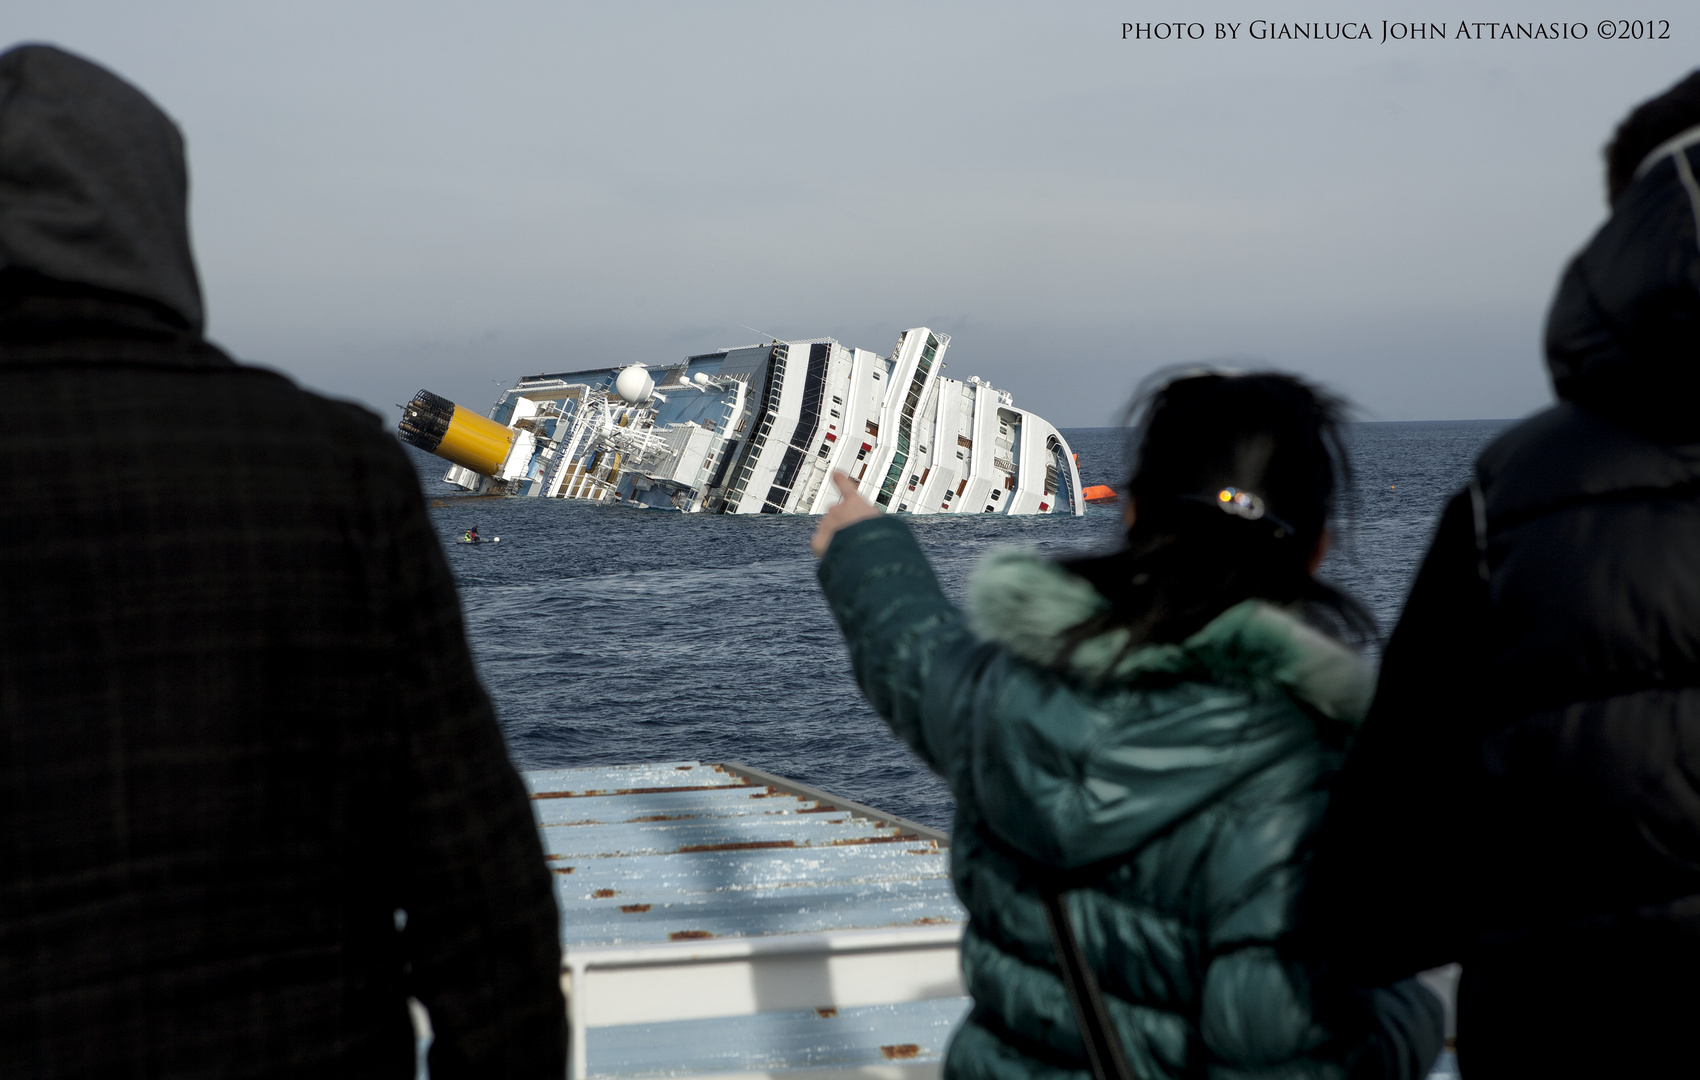 Costa Concordia disaster 6